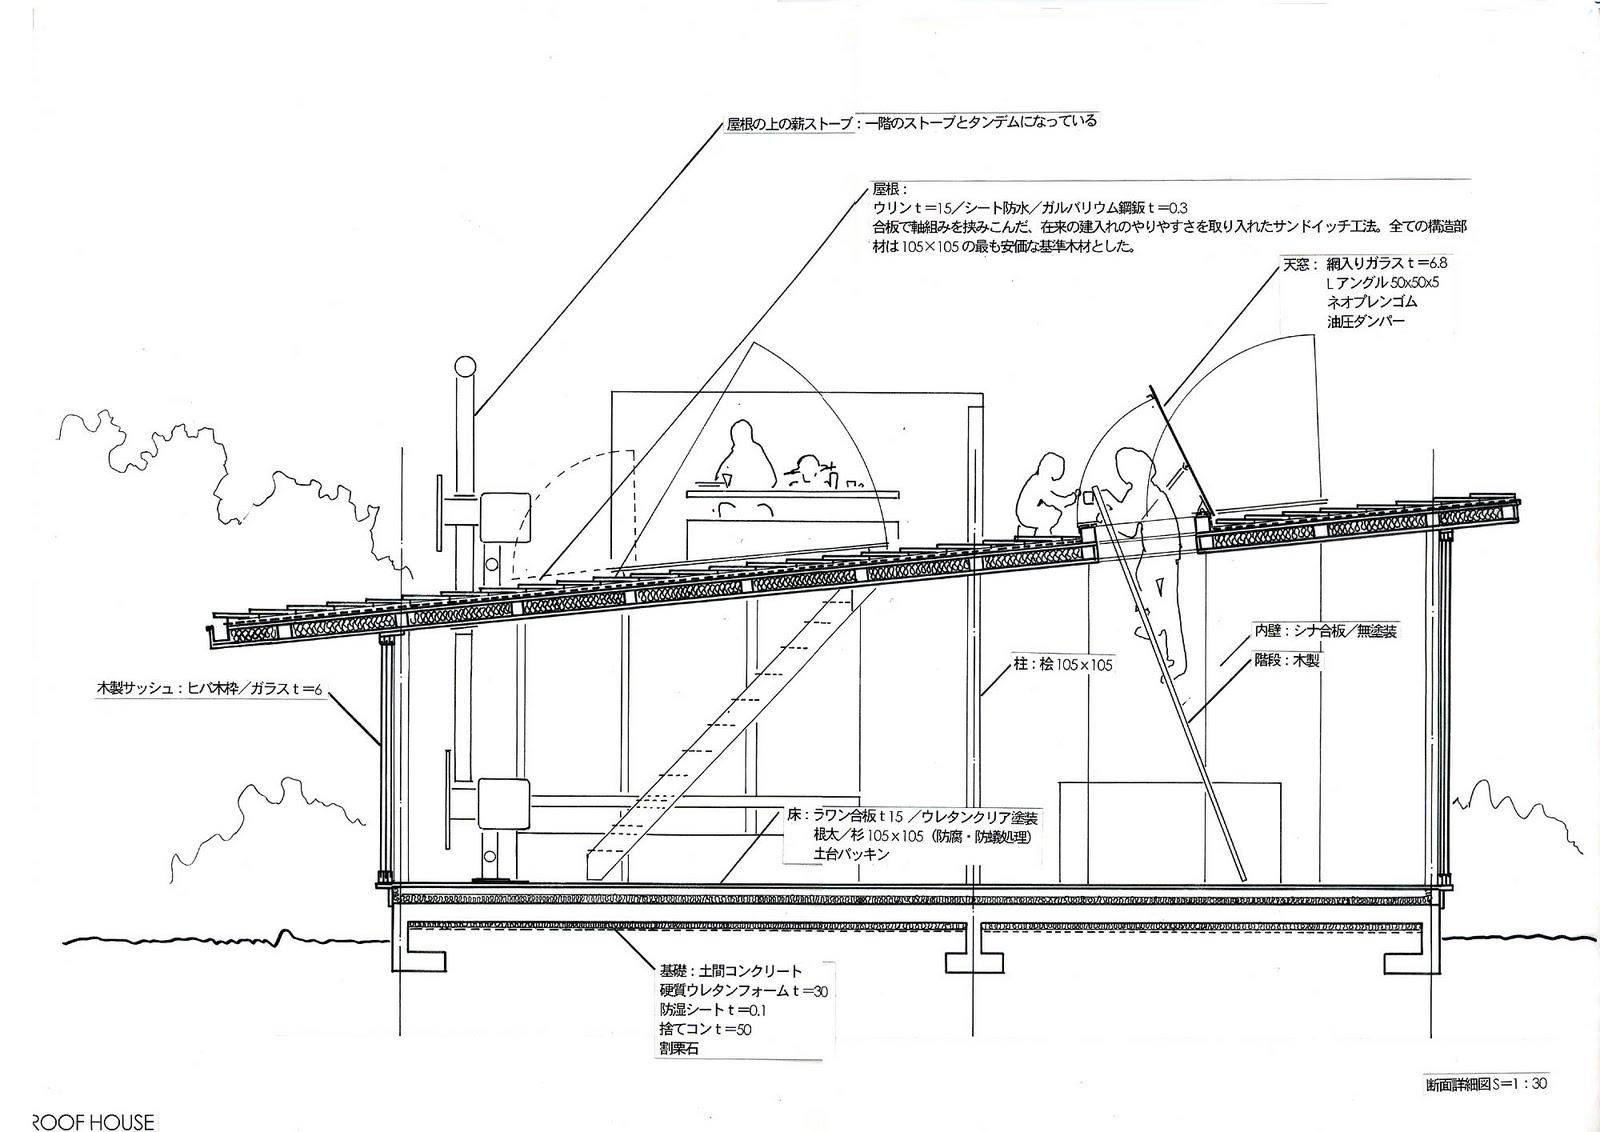 three hundred words: Roof House by Tezuka Architects